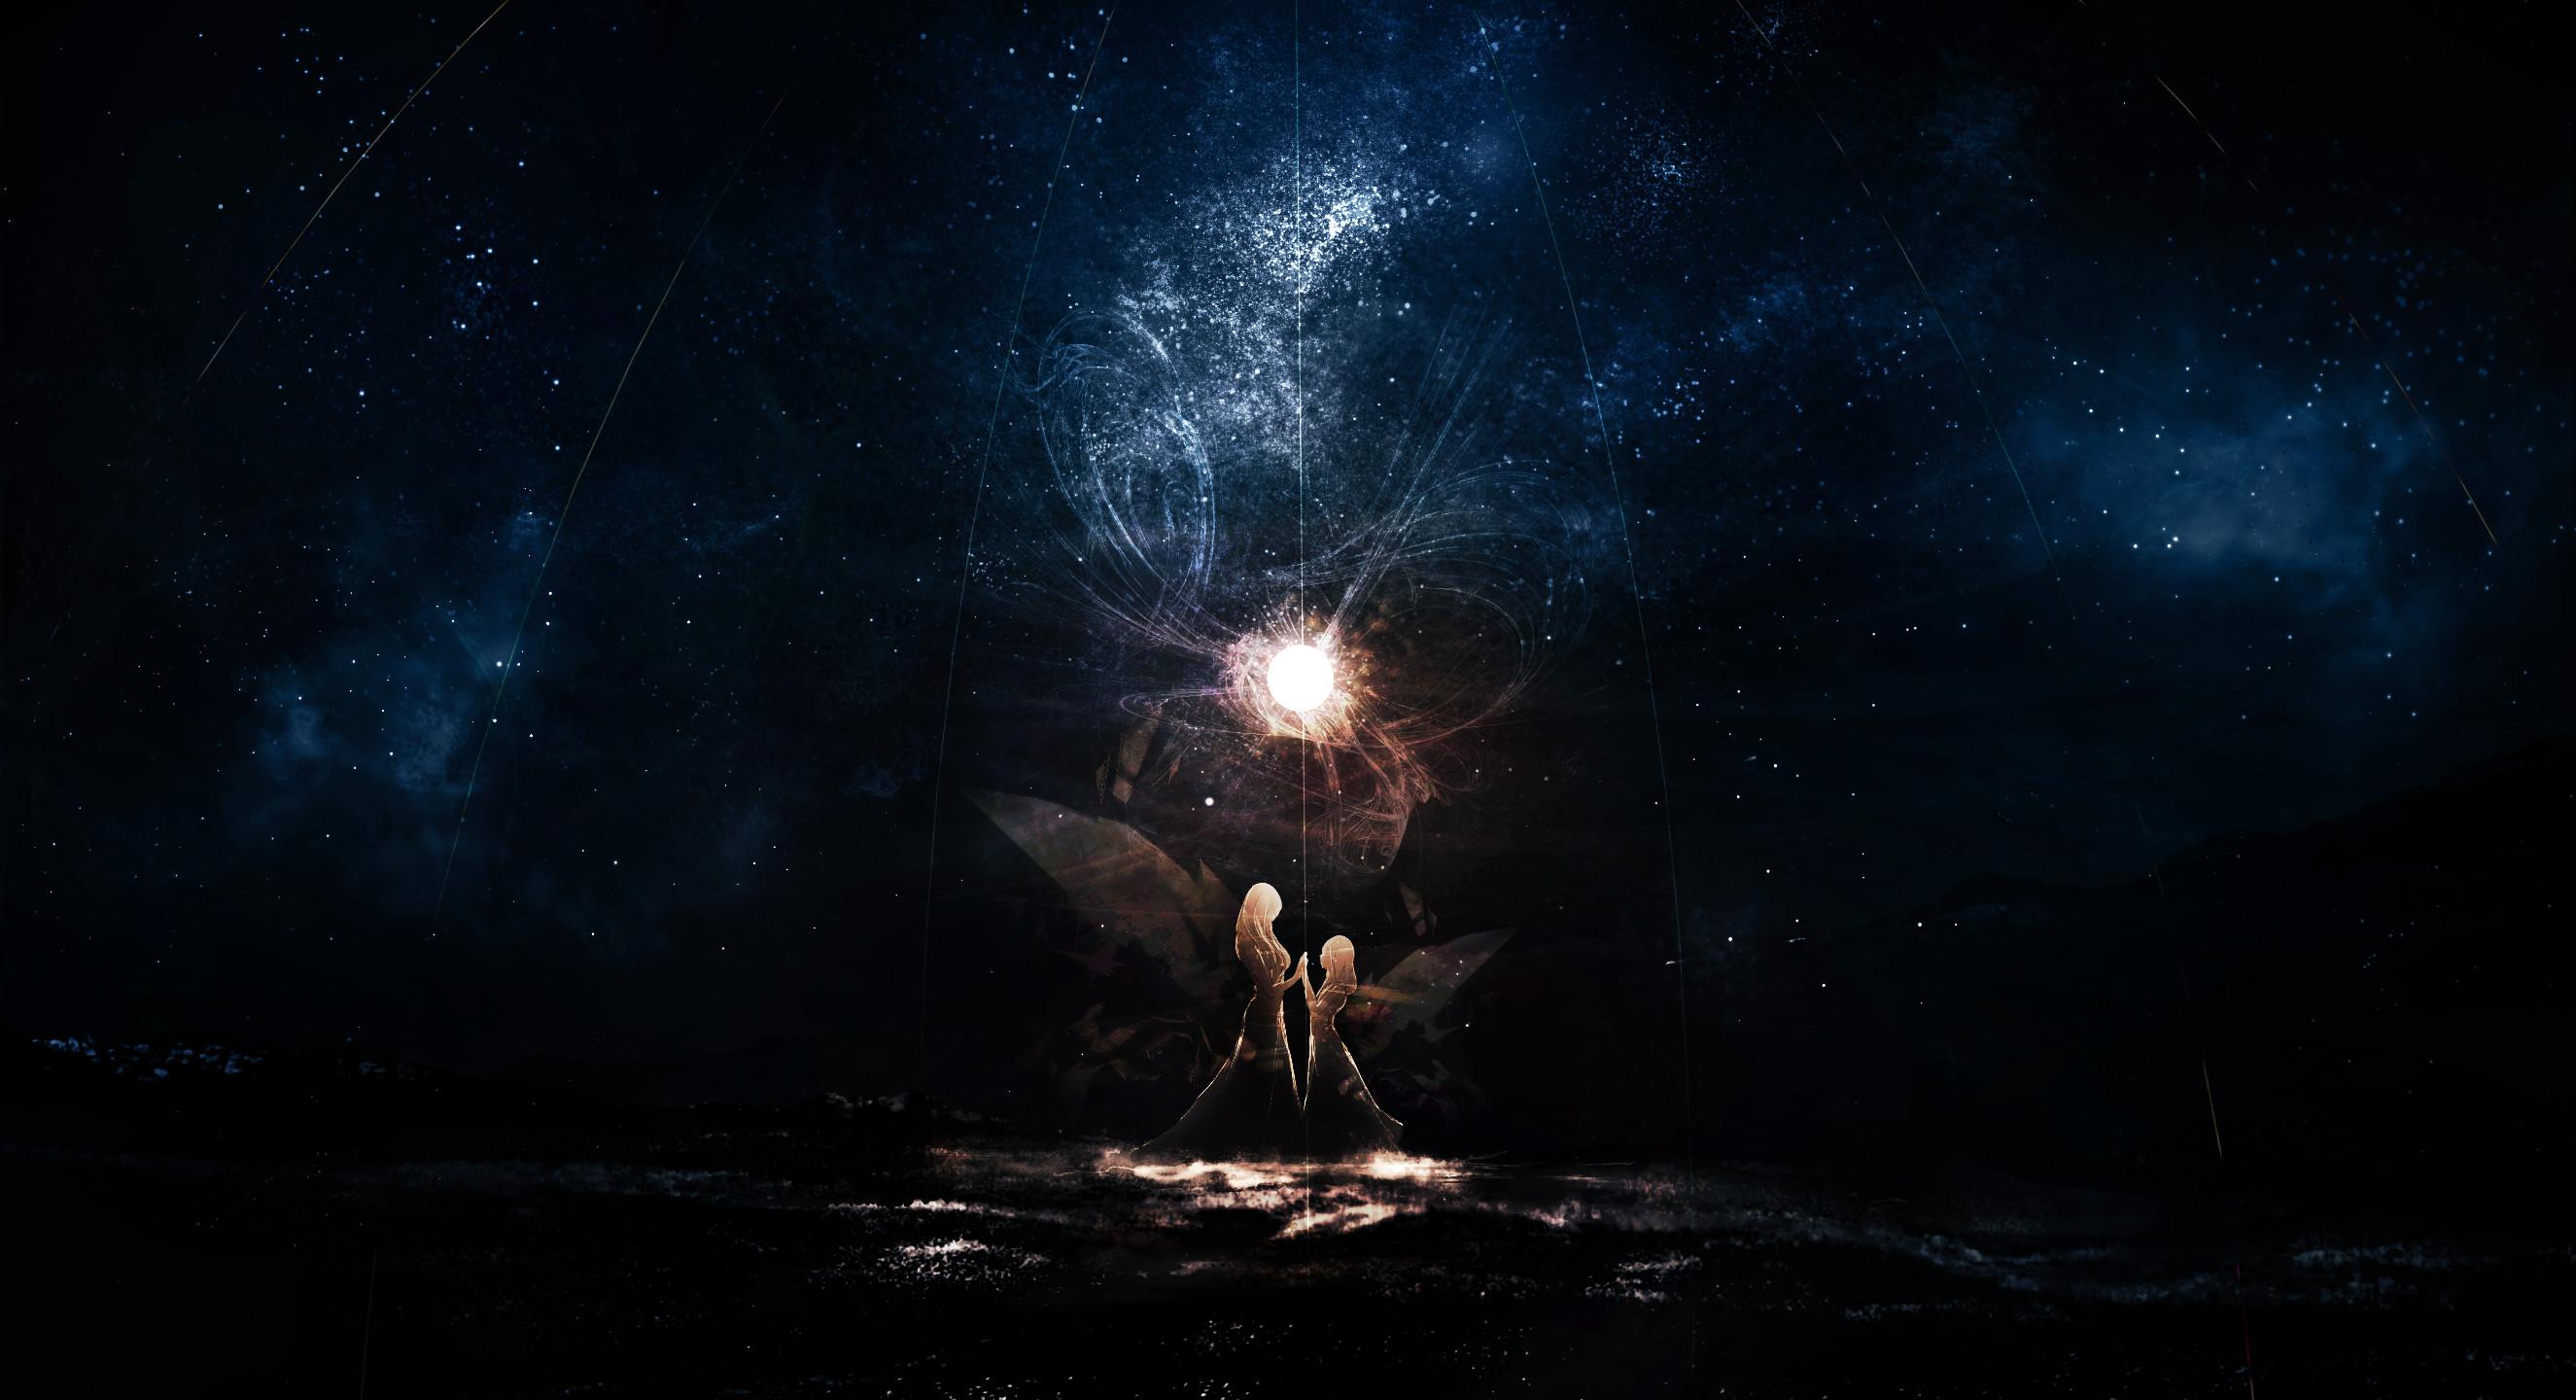 – anime girls, magic, stars, reflection, dark # original  resolution